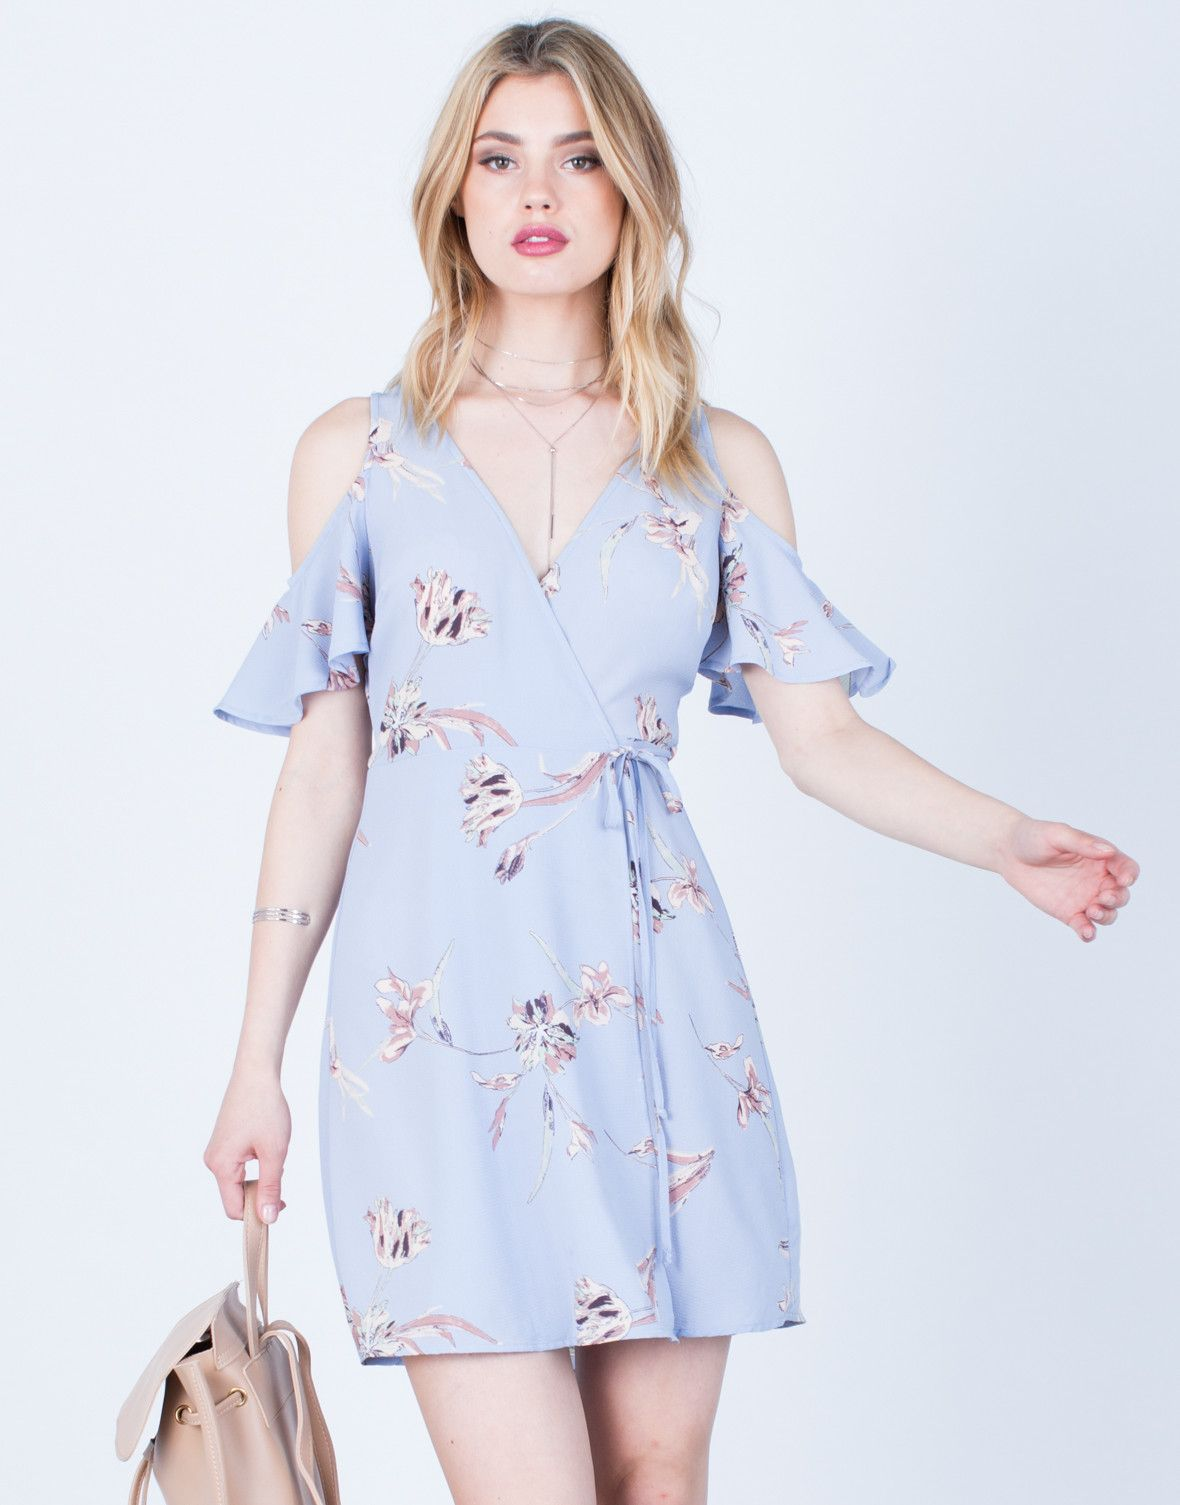 Vacay Wrap Dress - Light Purple Dress - Floral Dress - Wedding Guest ...